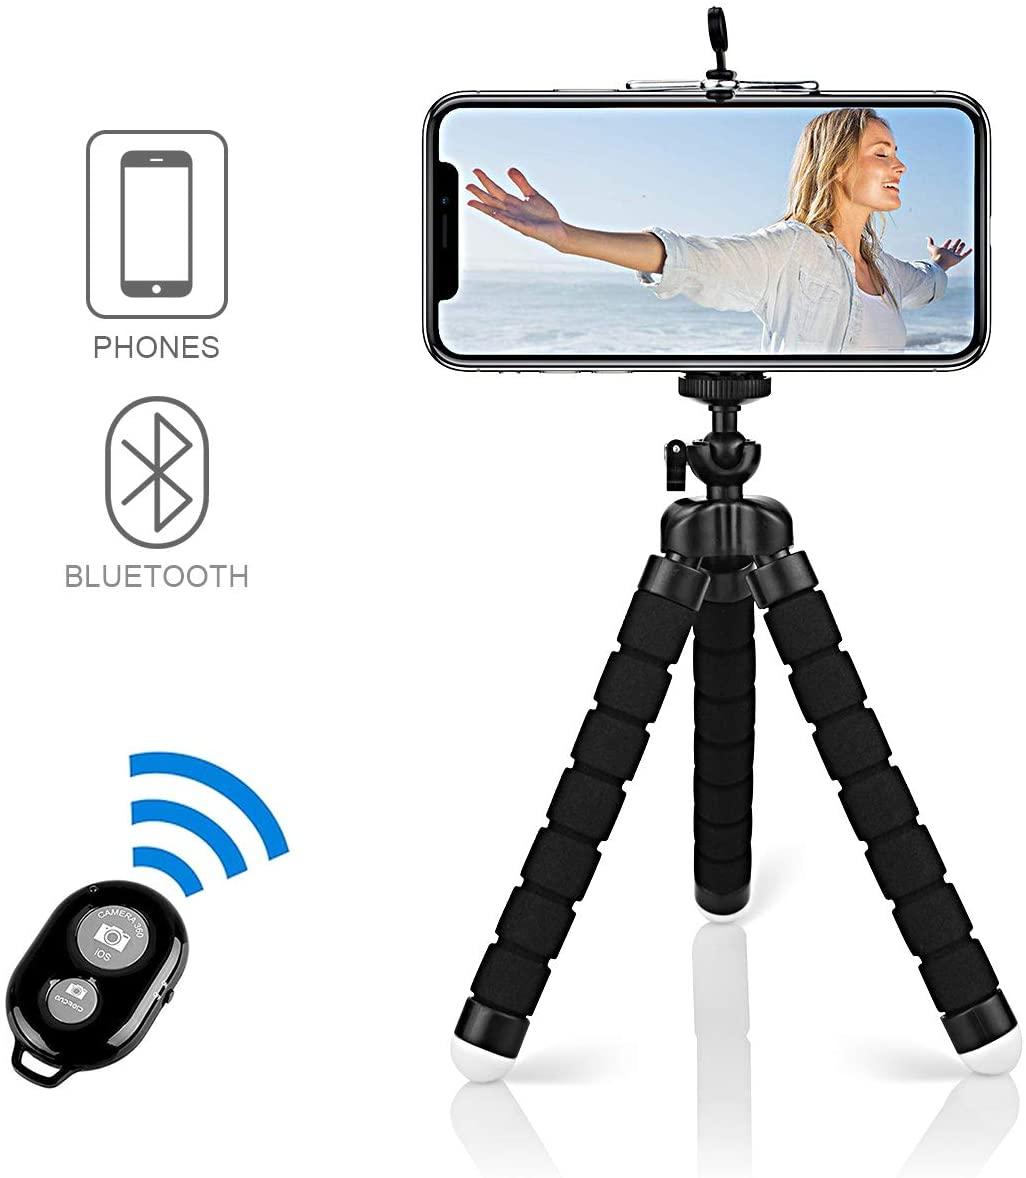 Portatile Treppiede Smartphone Con Telecomando Bluetooth